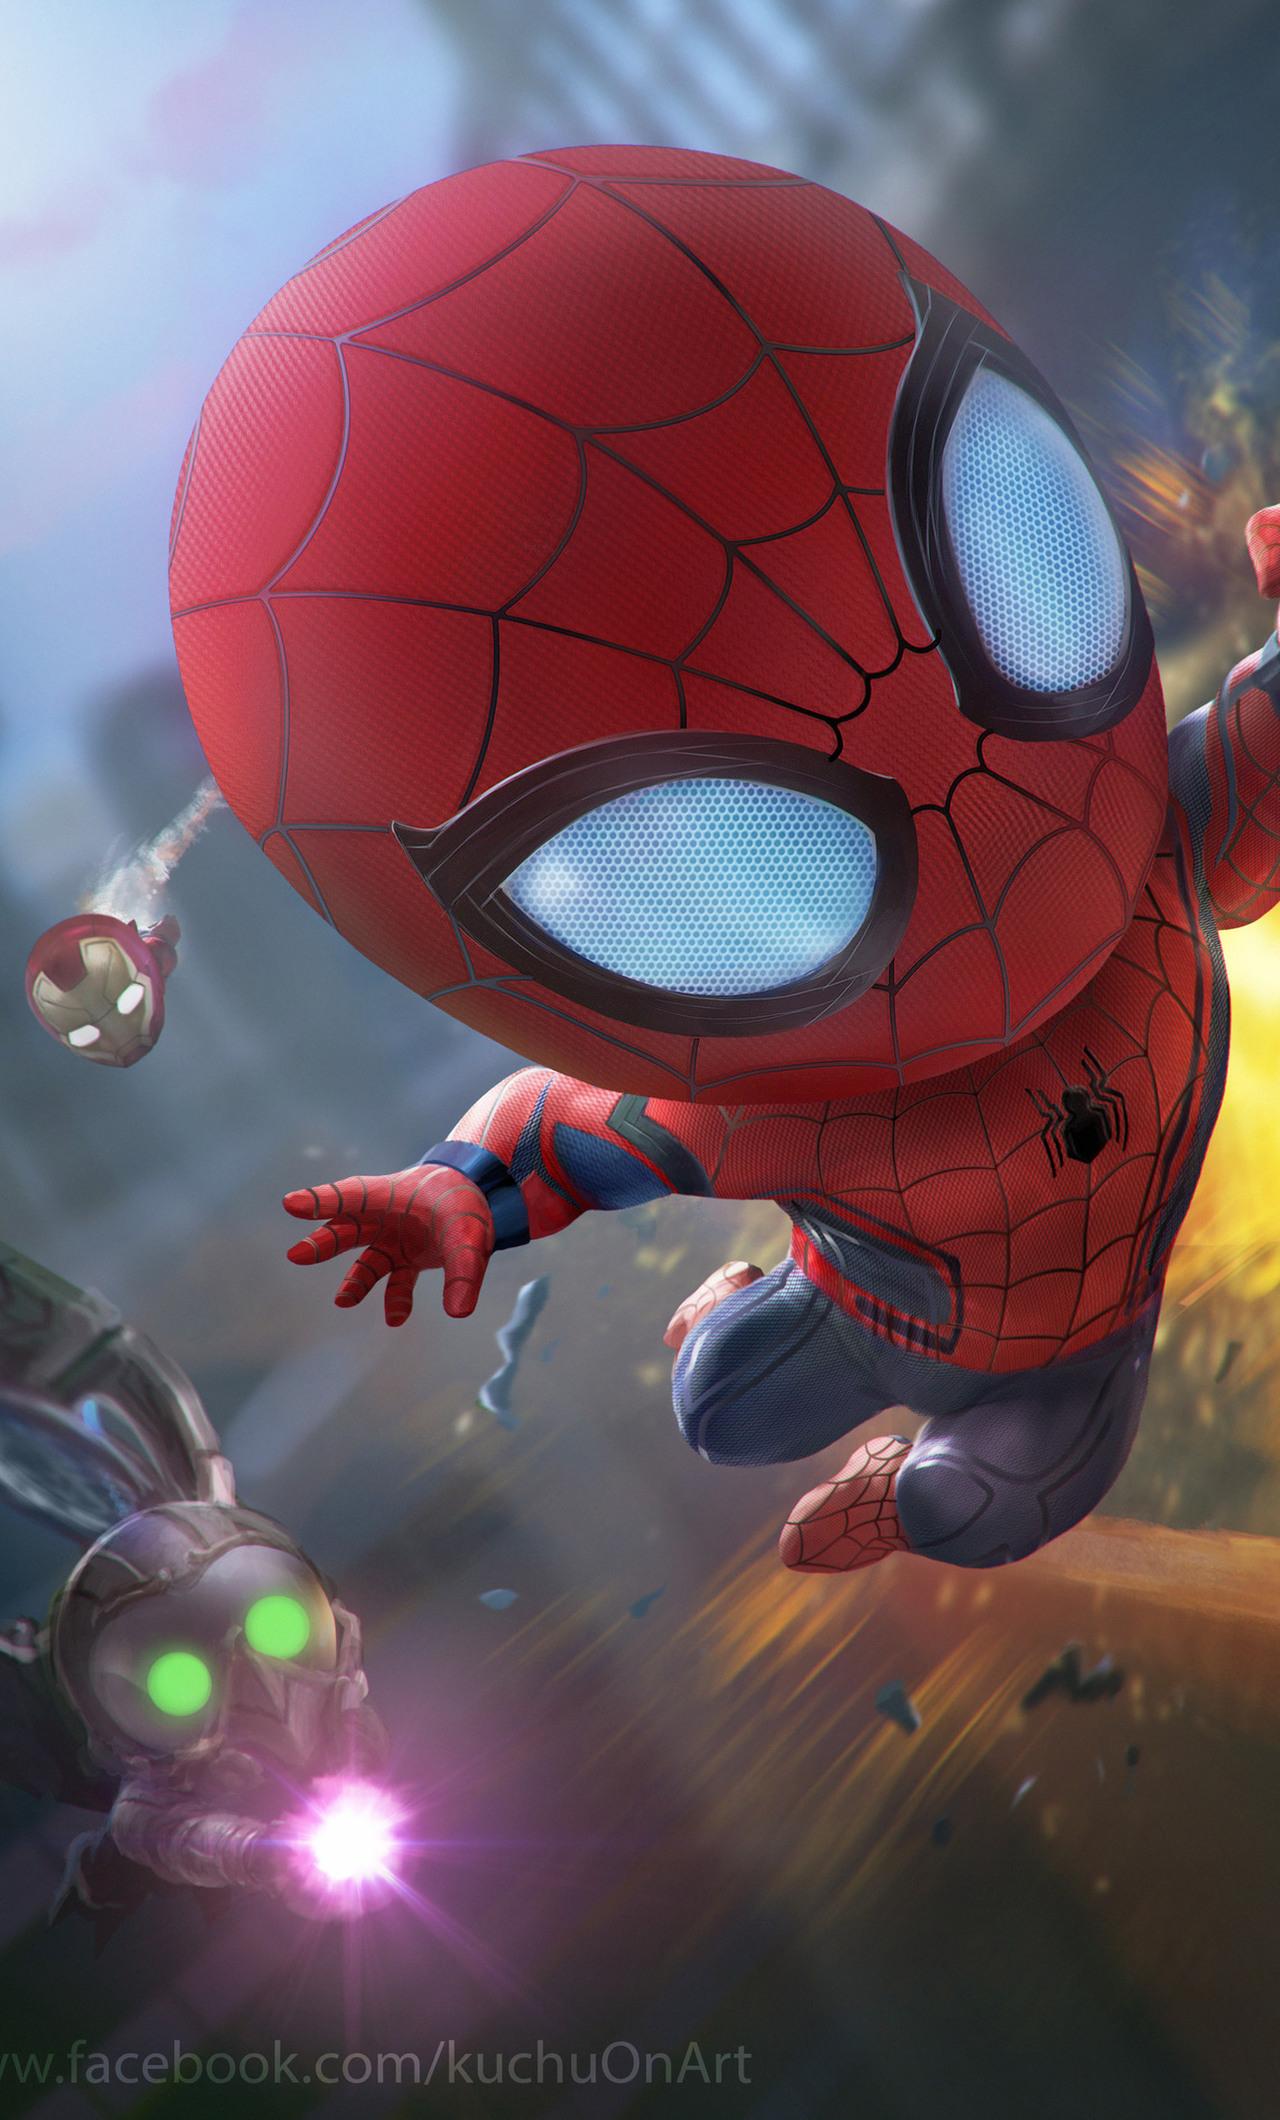 1280x2120 spiderman and iron man artwork hd iphone 6 hd - Spiderman and ironman wallpaper ...